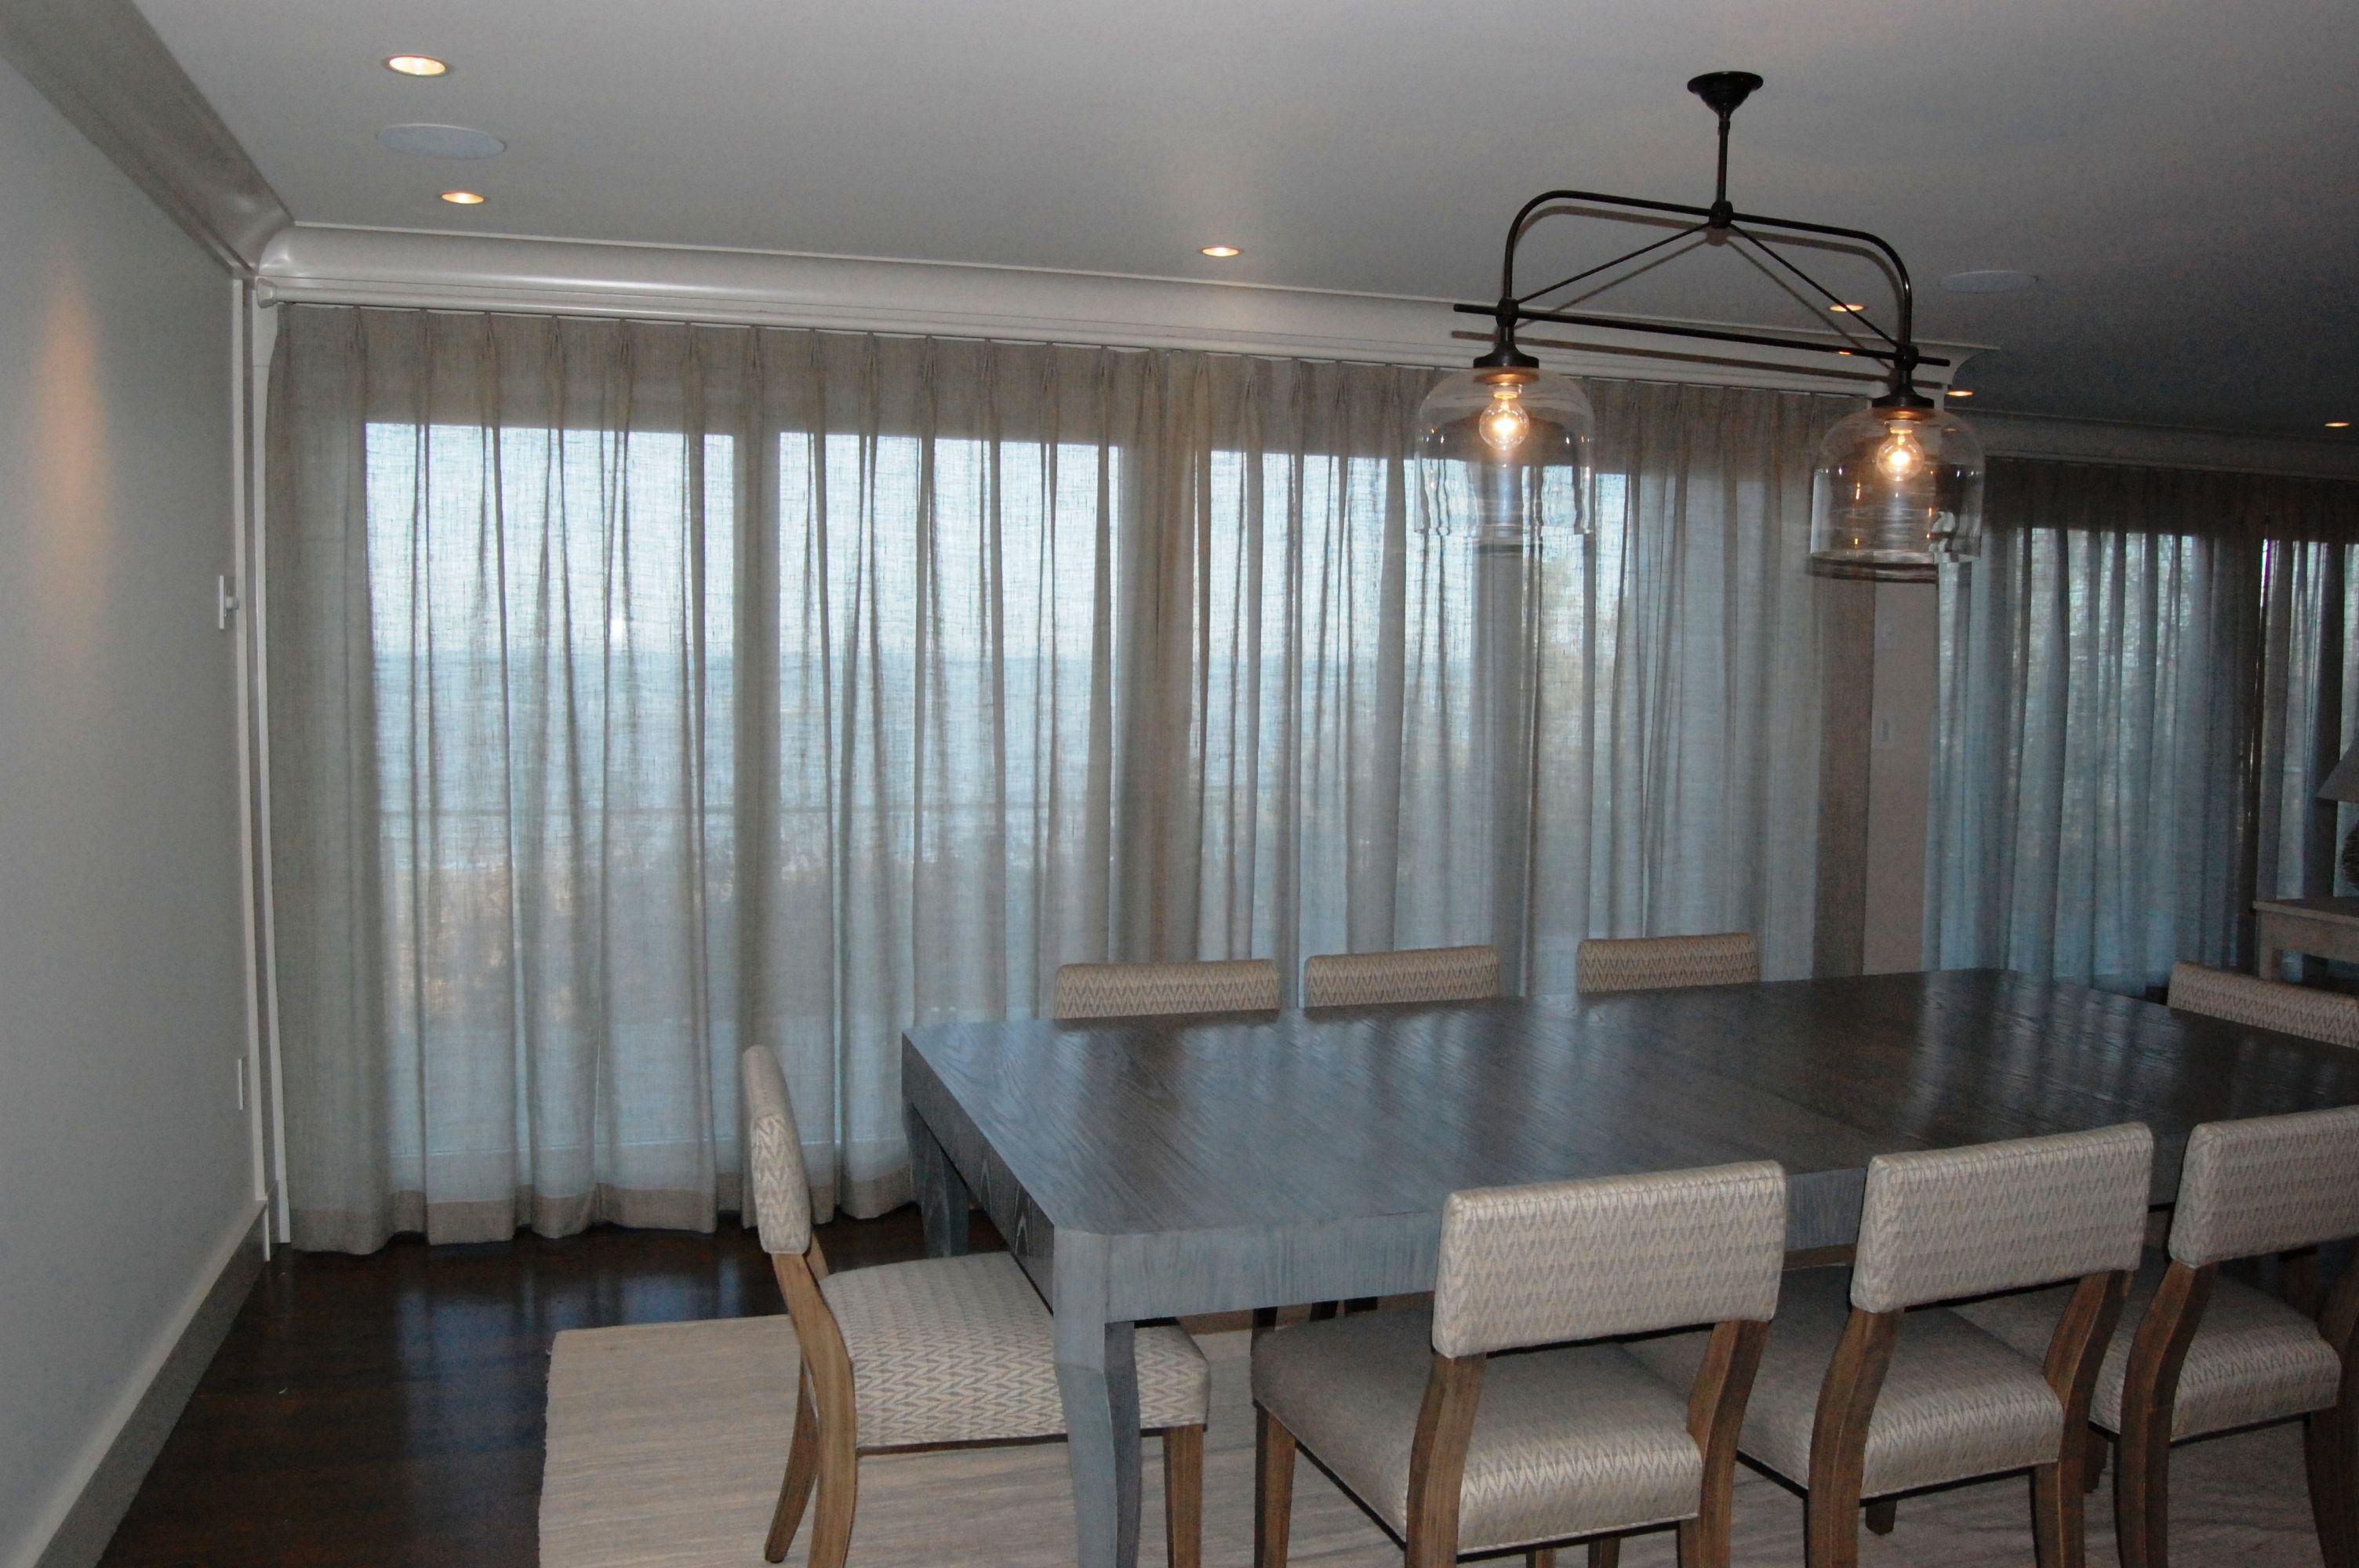 wa budget vancouver white tile floor sidecar lounge countertop fairy quartz pin customer blinds